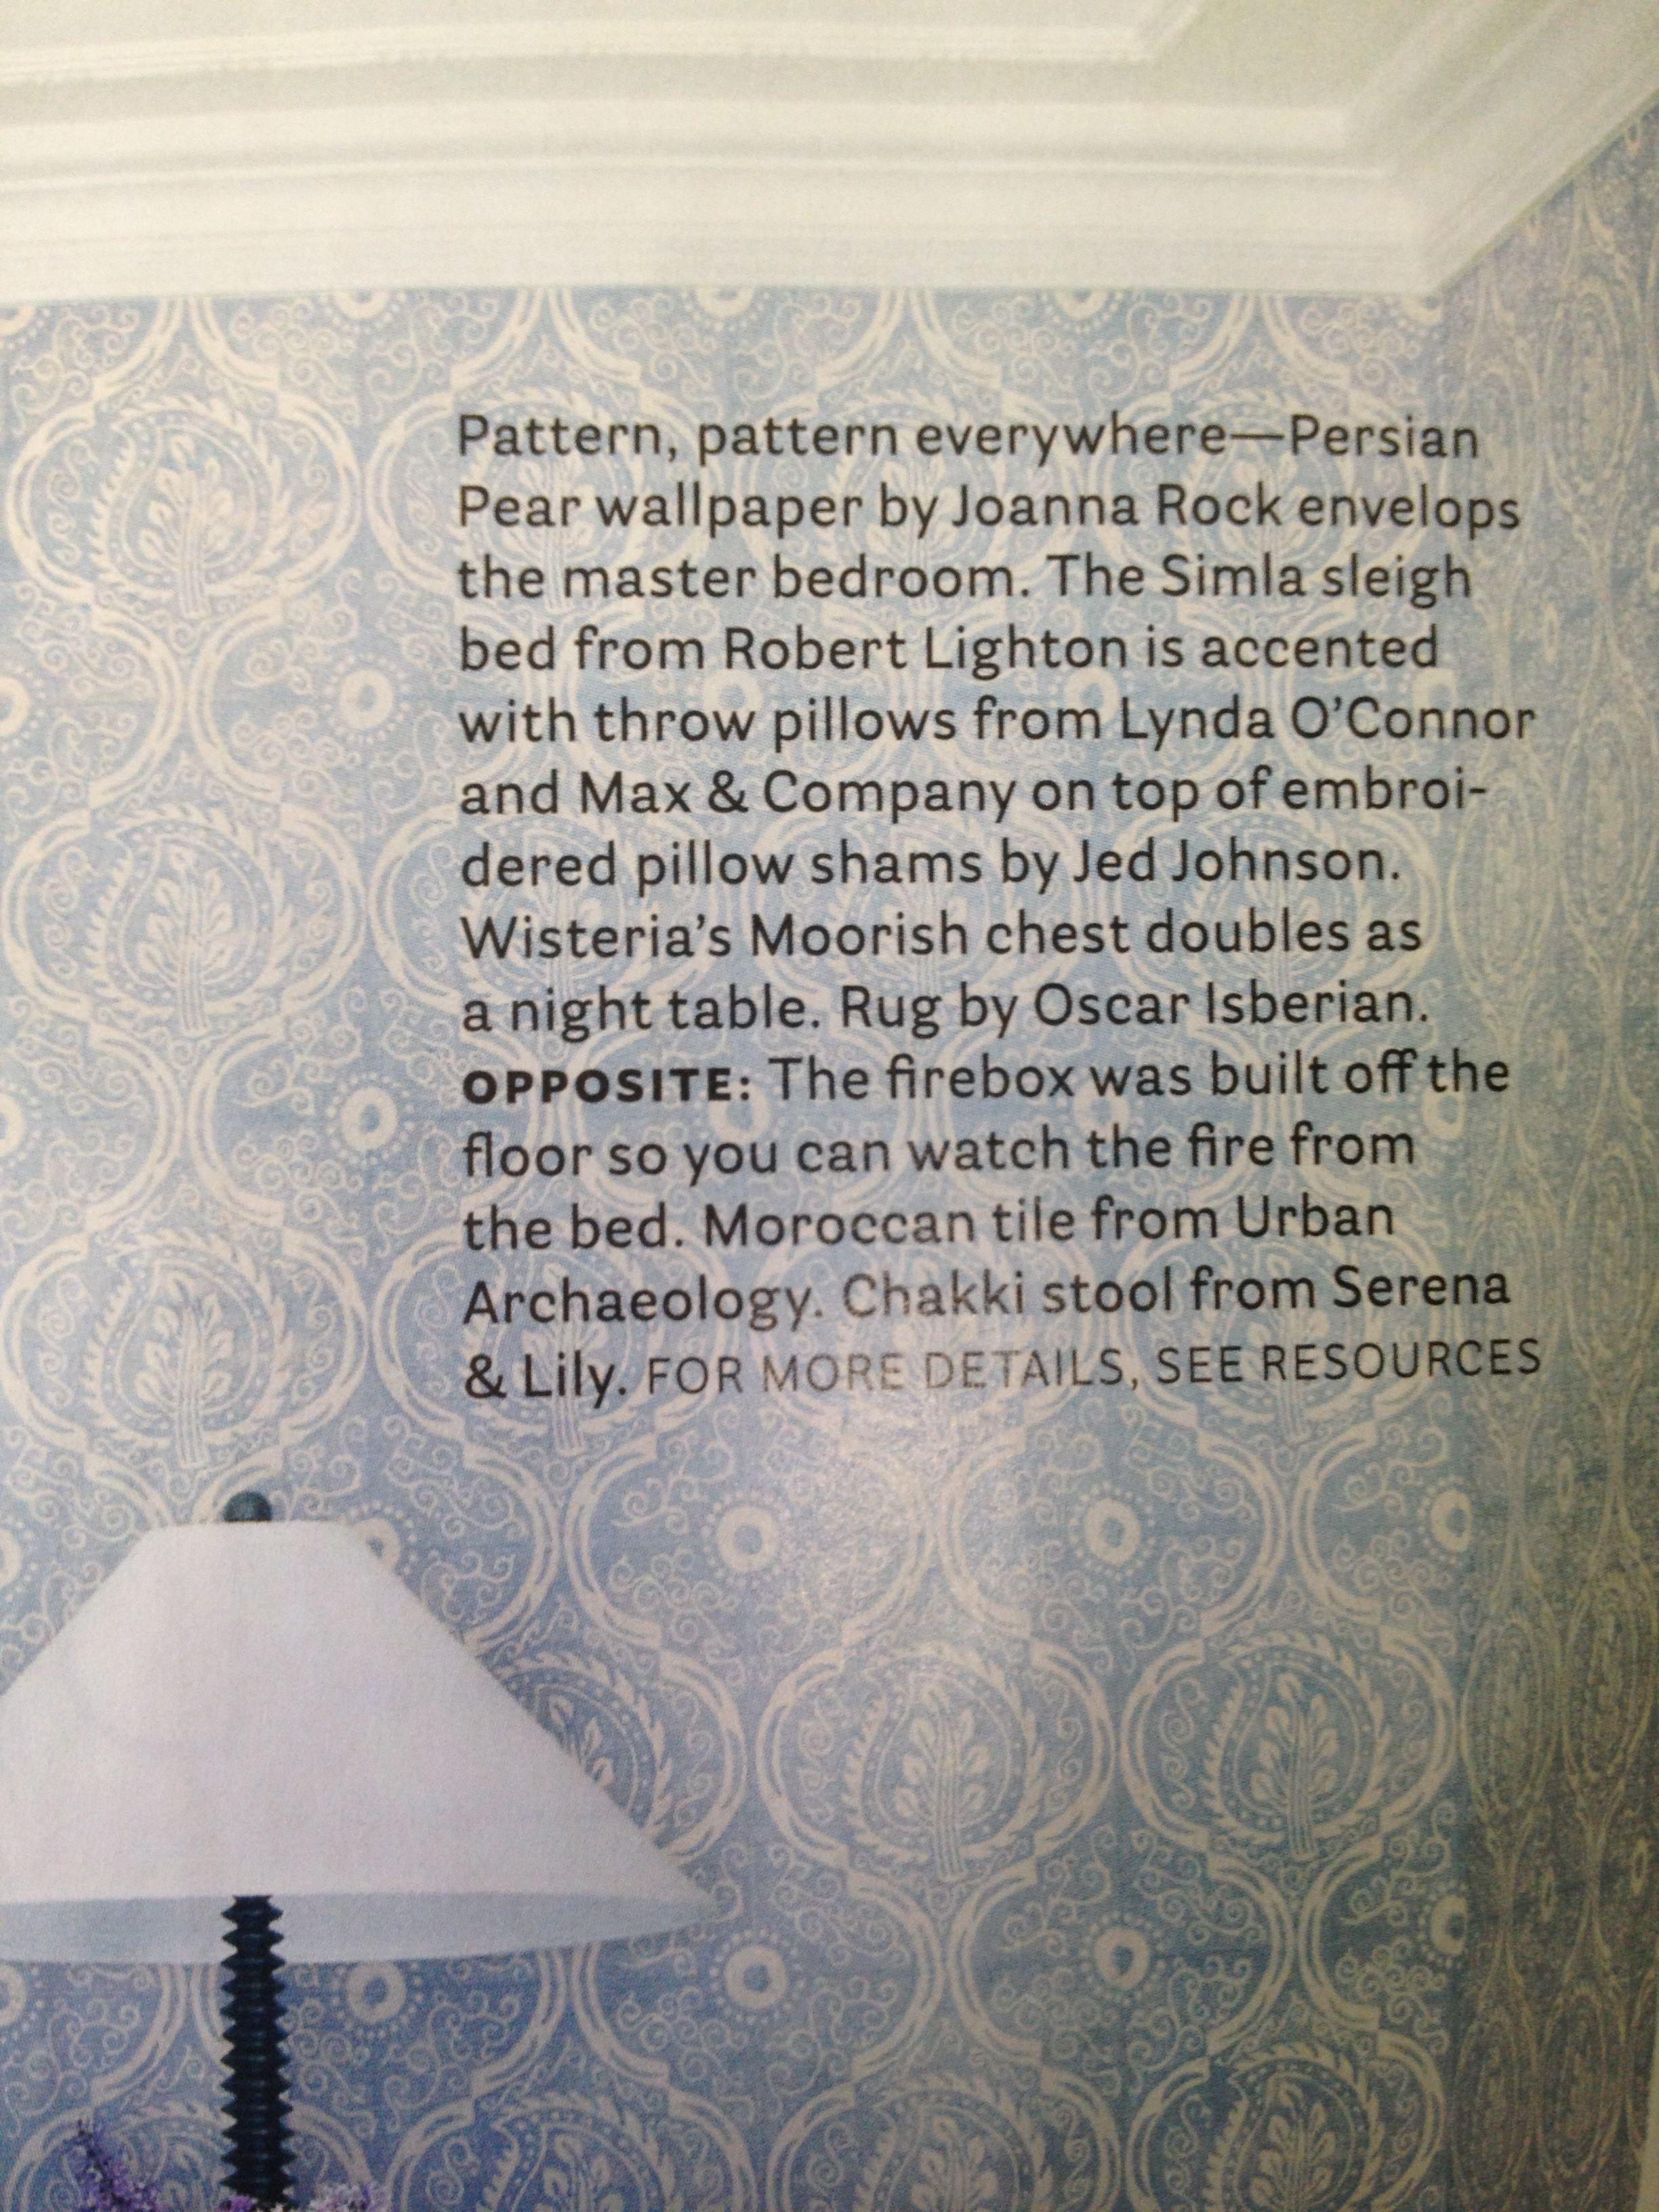 House Beautiful Magazine ; Persian Pear Wallpaper by Joanna Rock.